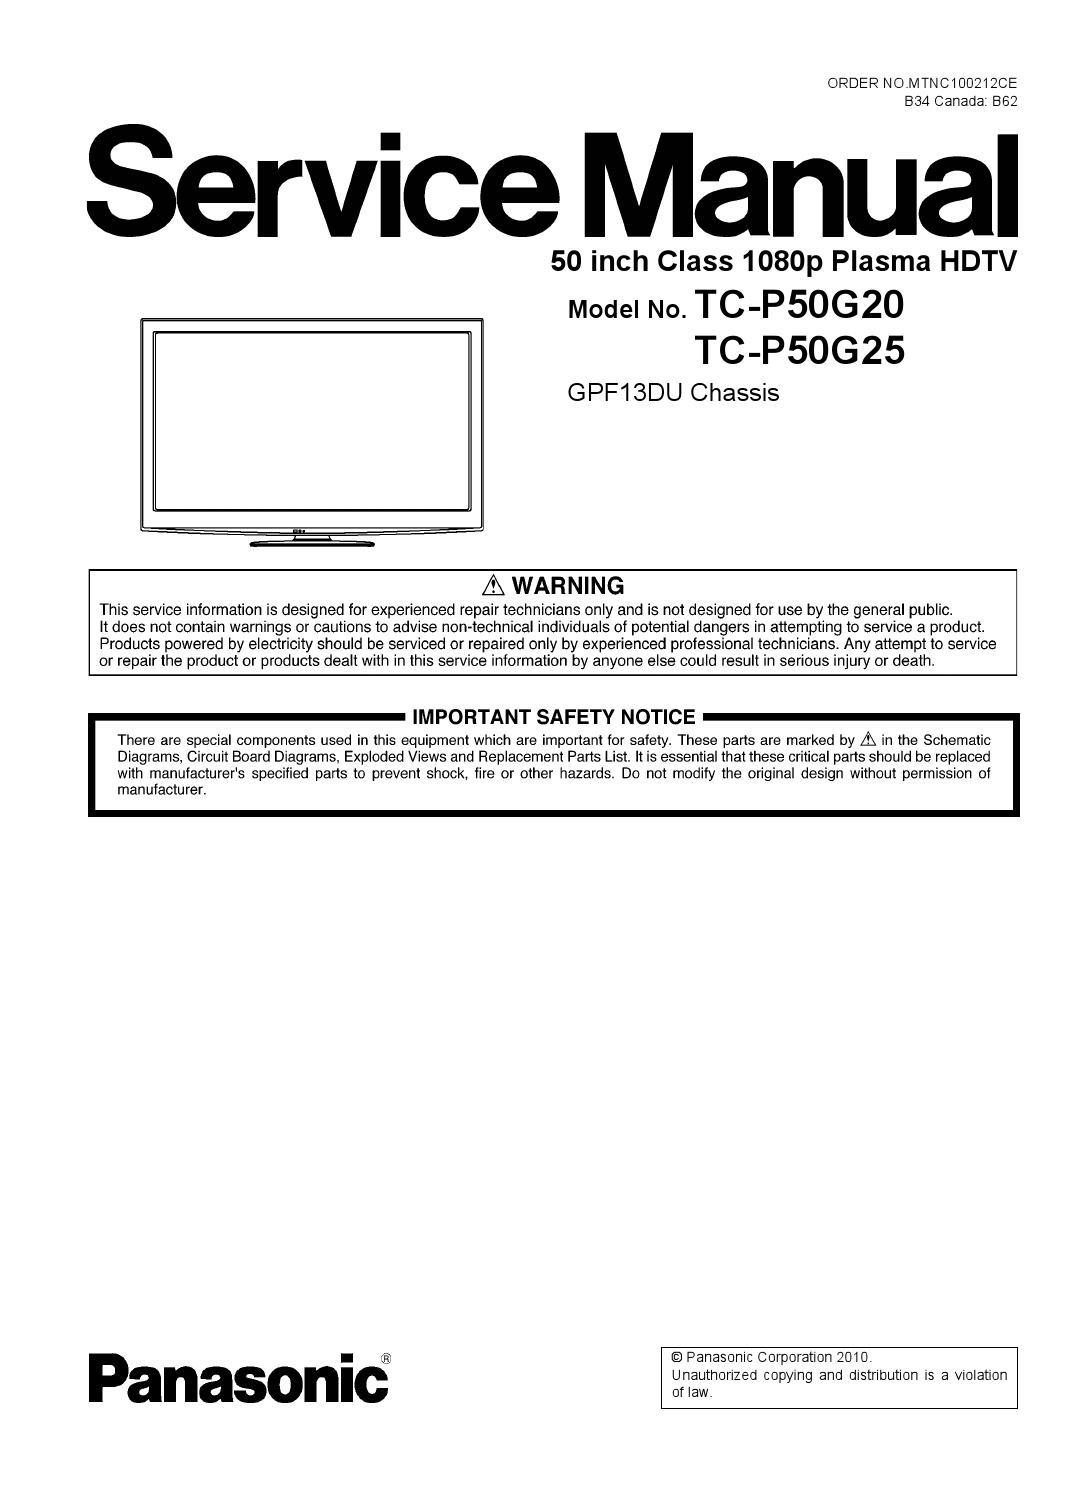 Plasma Tv Manual 2005 Lg 50 Inch Screen Circuit Boards In Back Of Array Panasonic Rh Apnmata